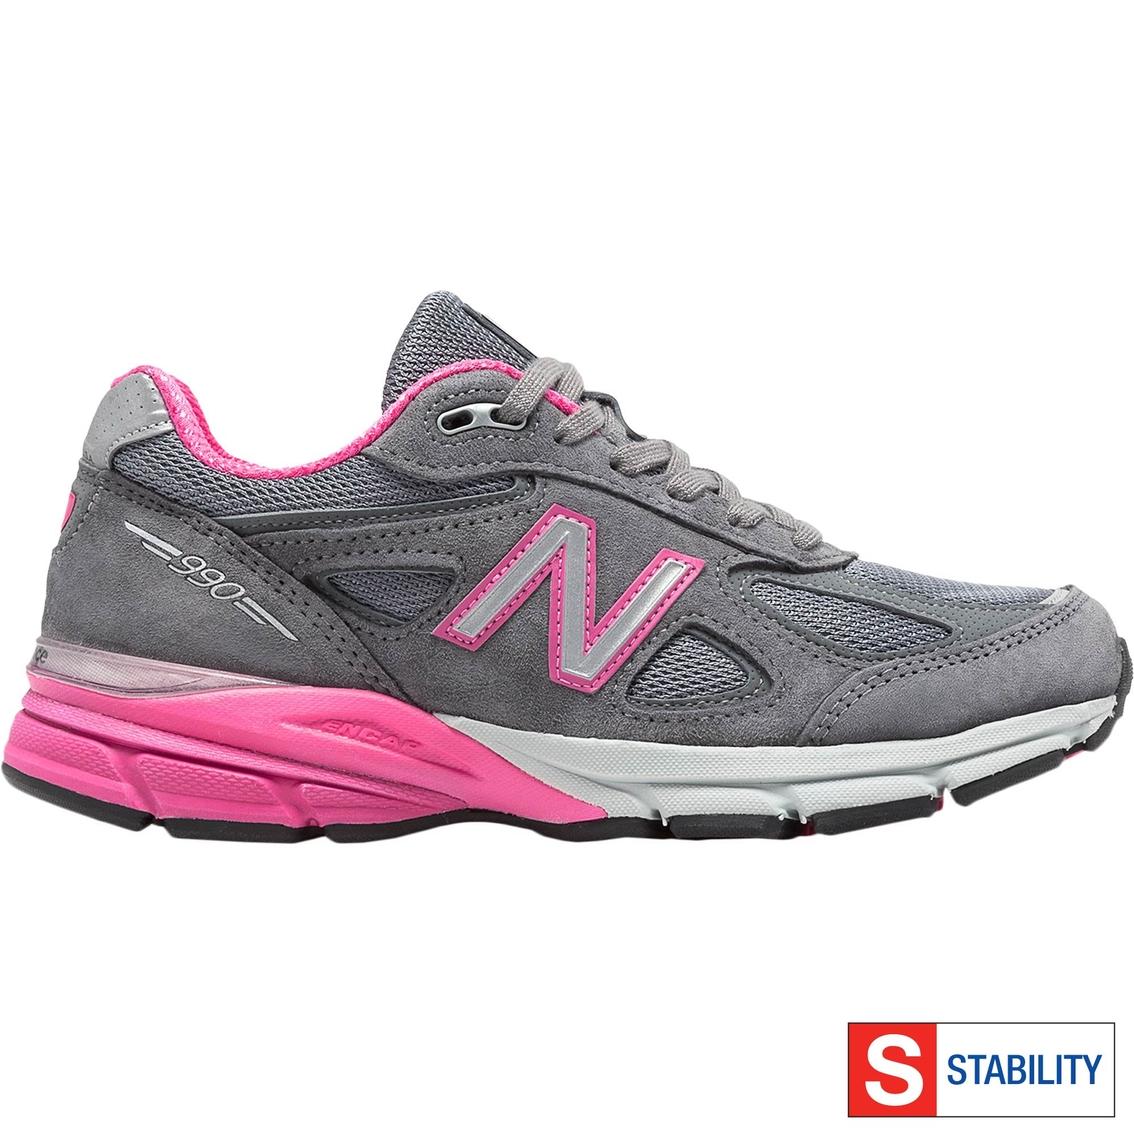 the best attitude f5da6 06823 New Balance Women's W990gp4 Running Shoes | Running | Shoes ...